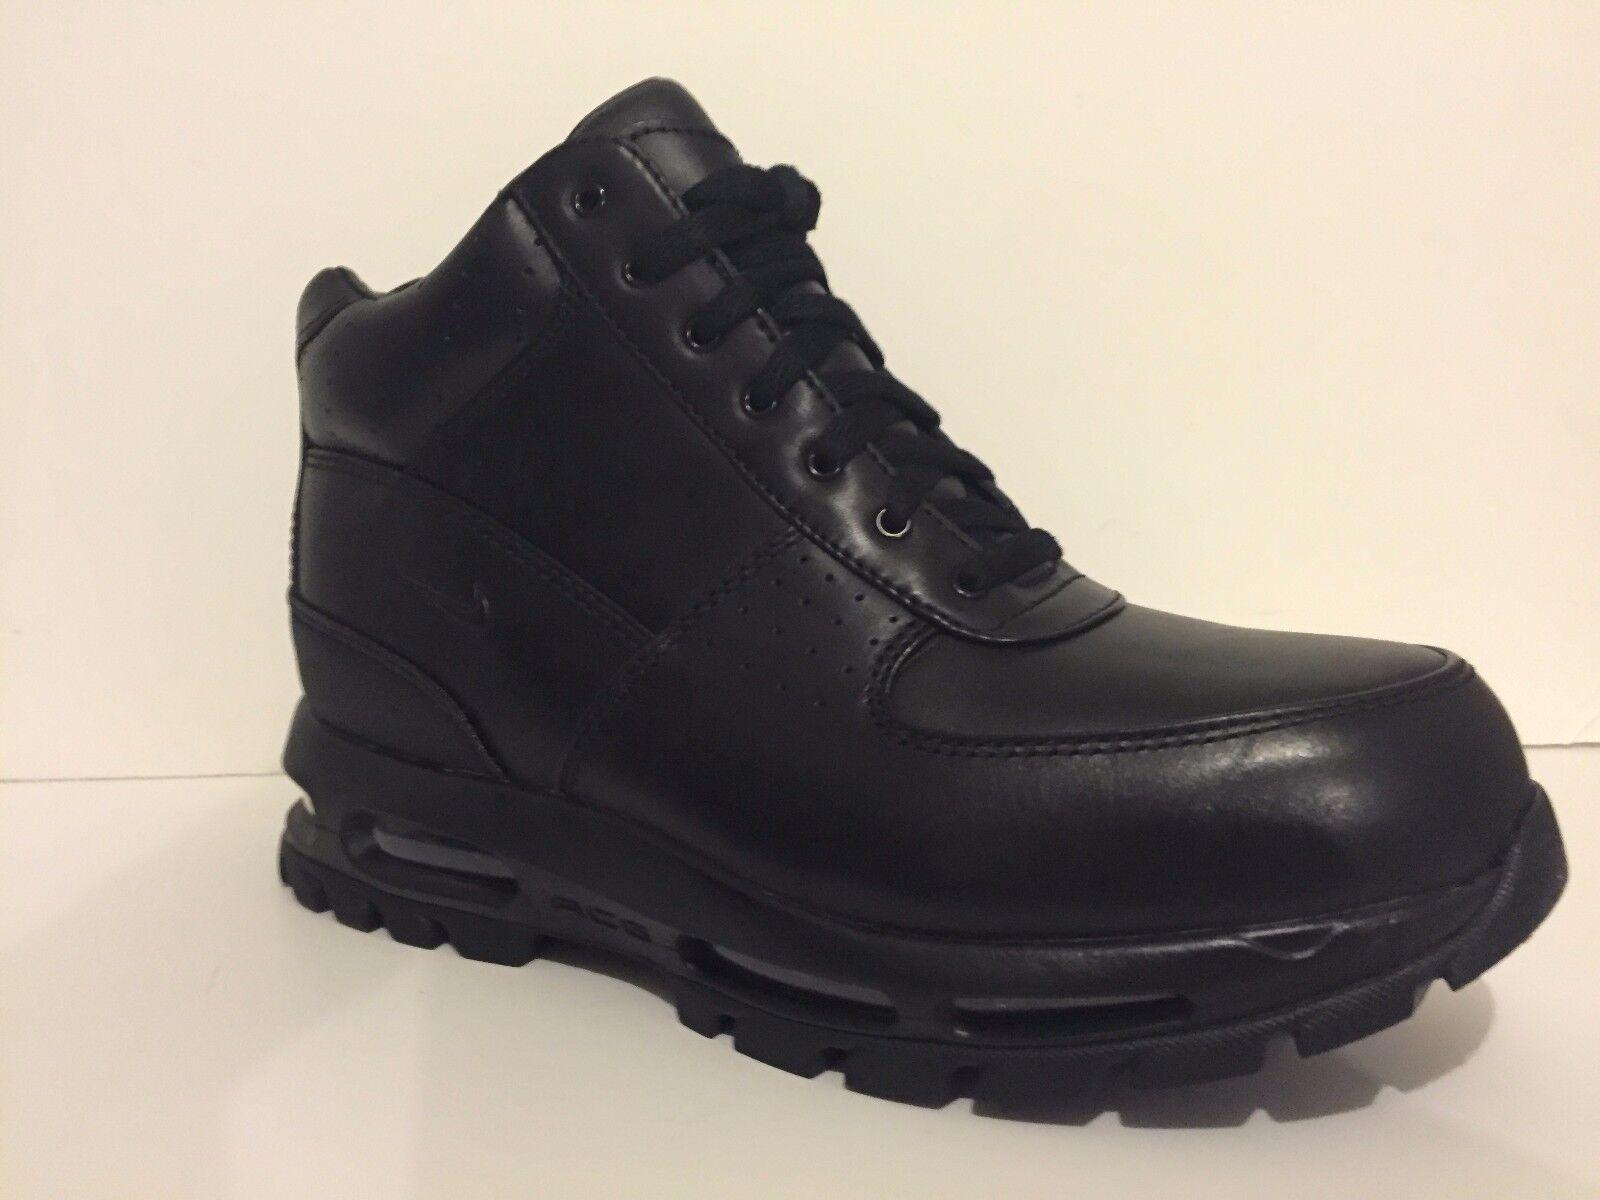 promo code 2481e ee18e top 10 jordan shoes size 15 nike acg goadome